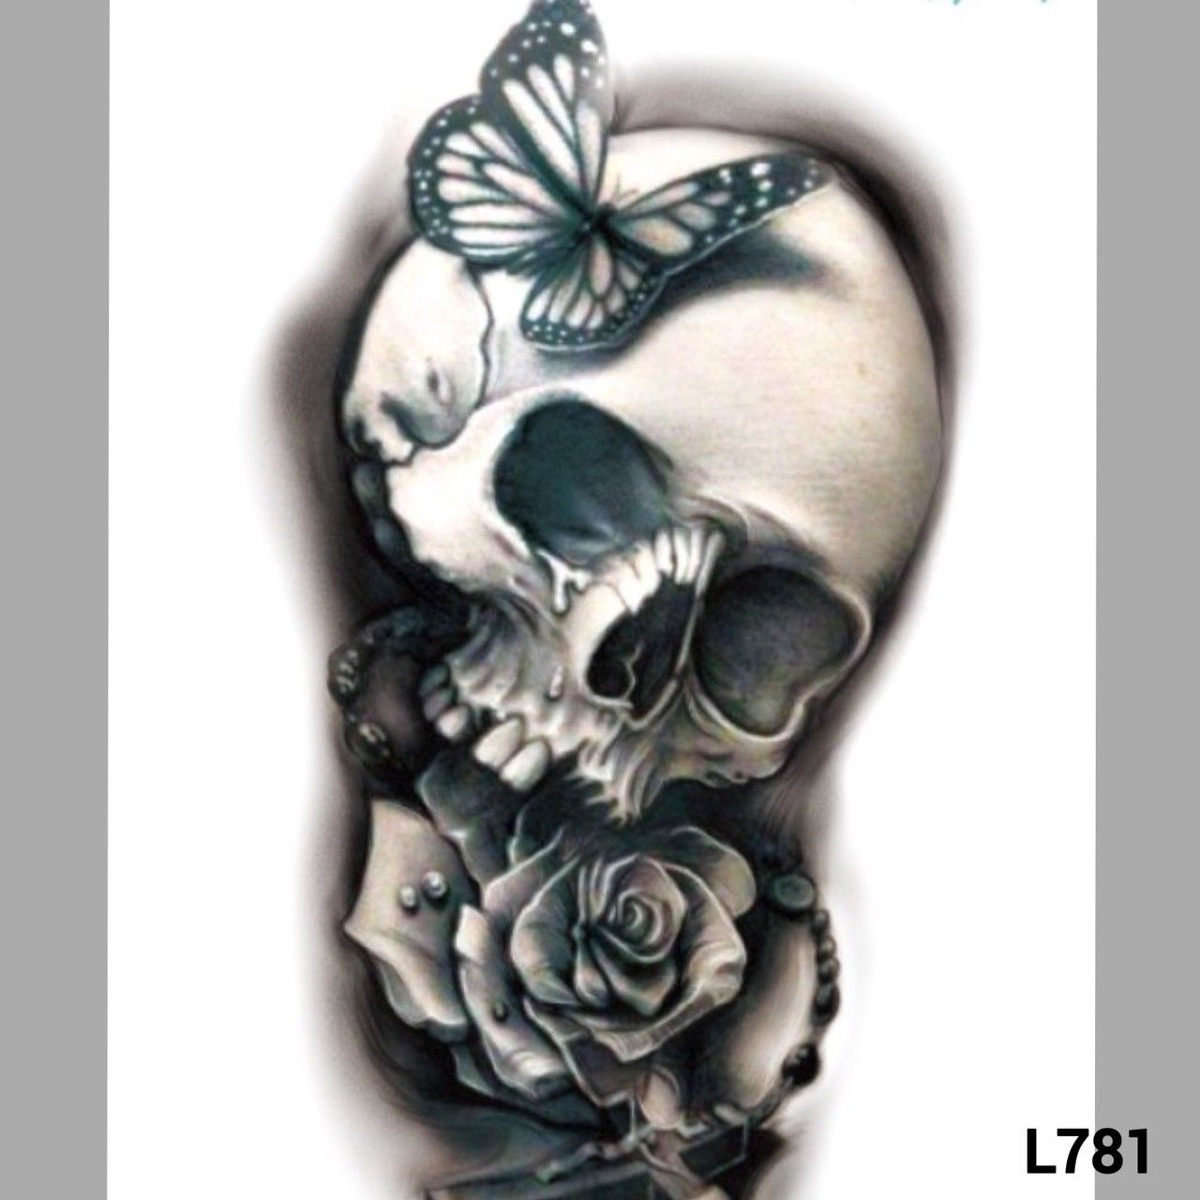 Tatuajes Temporales Tatuajes Grandes Brazo Pierna L781